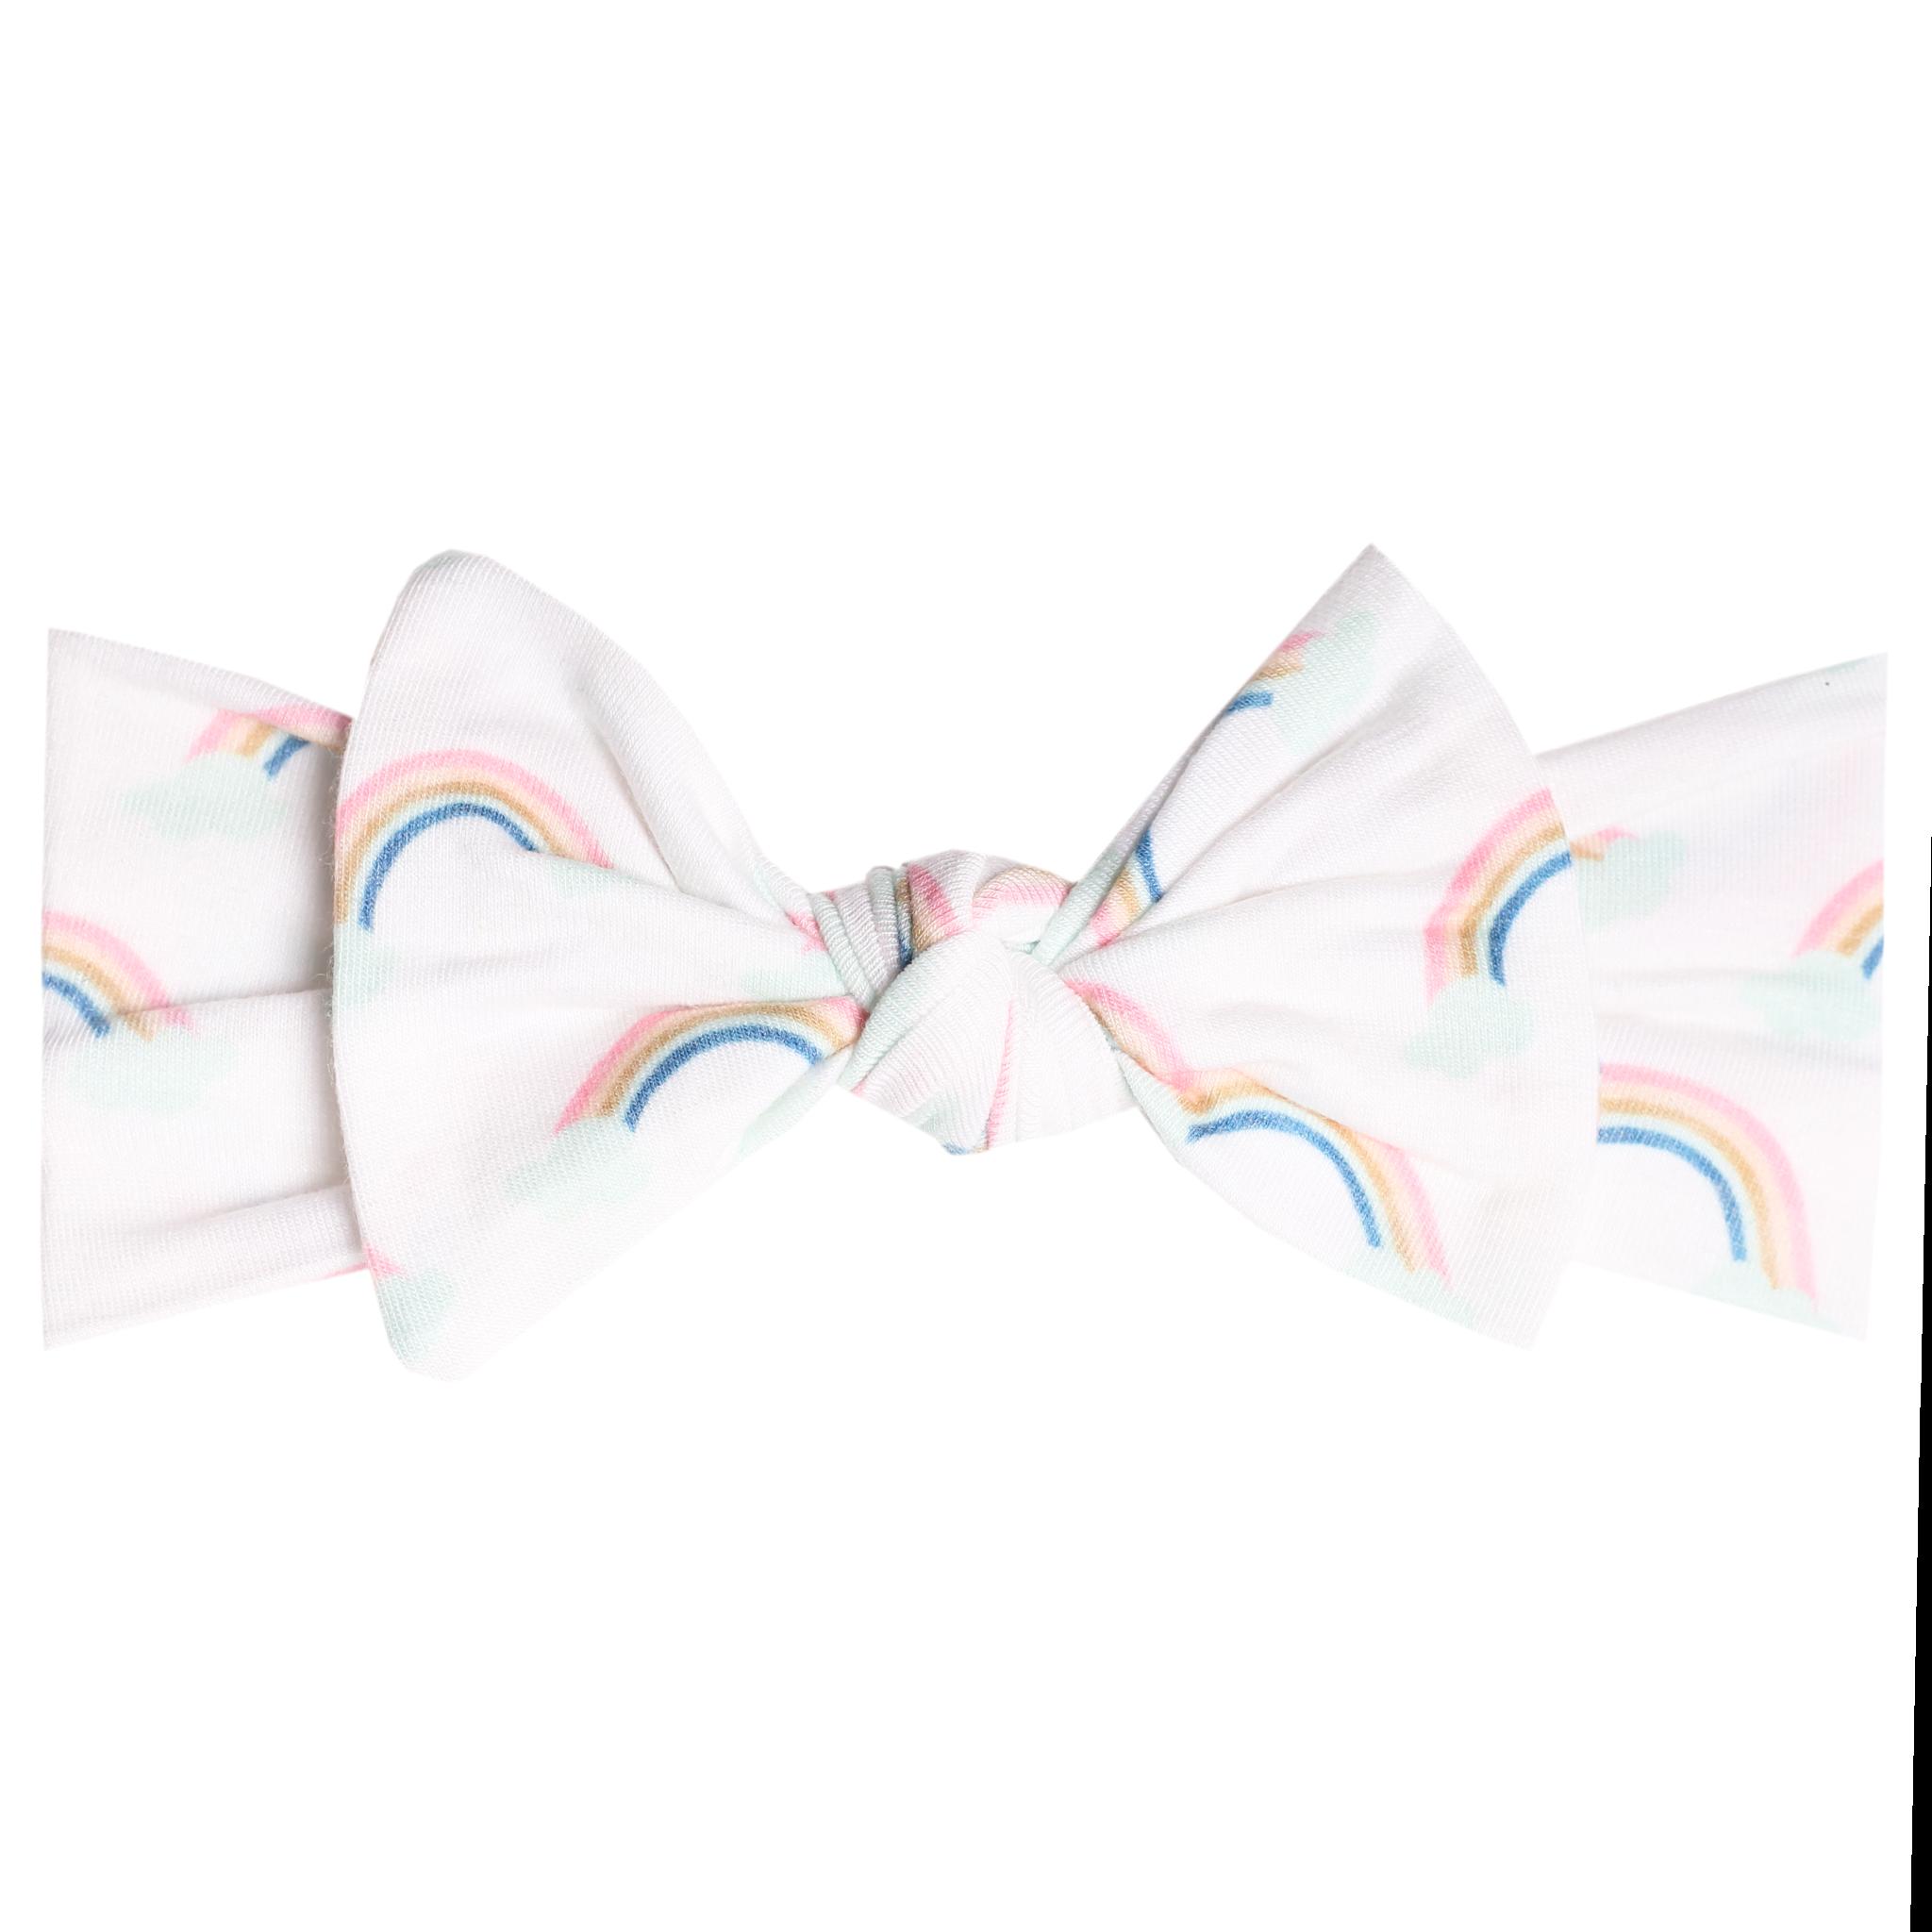 Copper Pearl Knit Headband Daydream